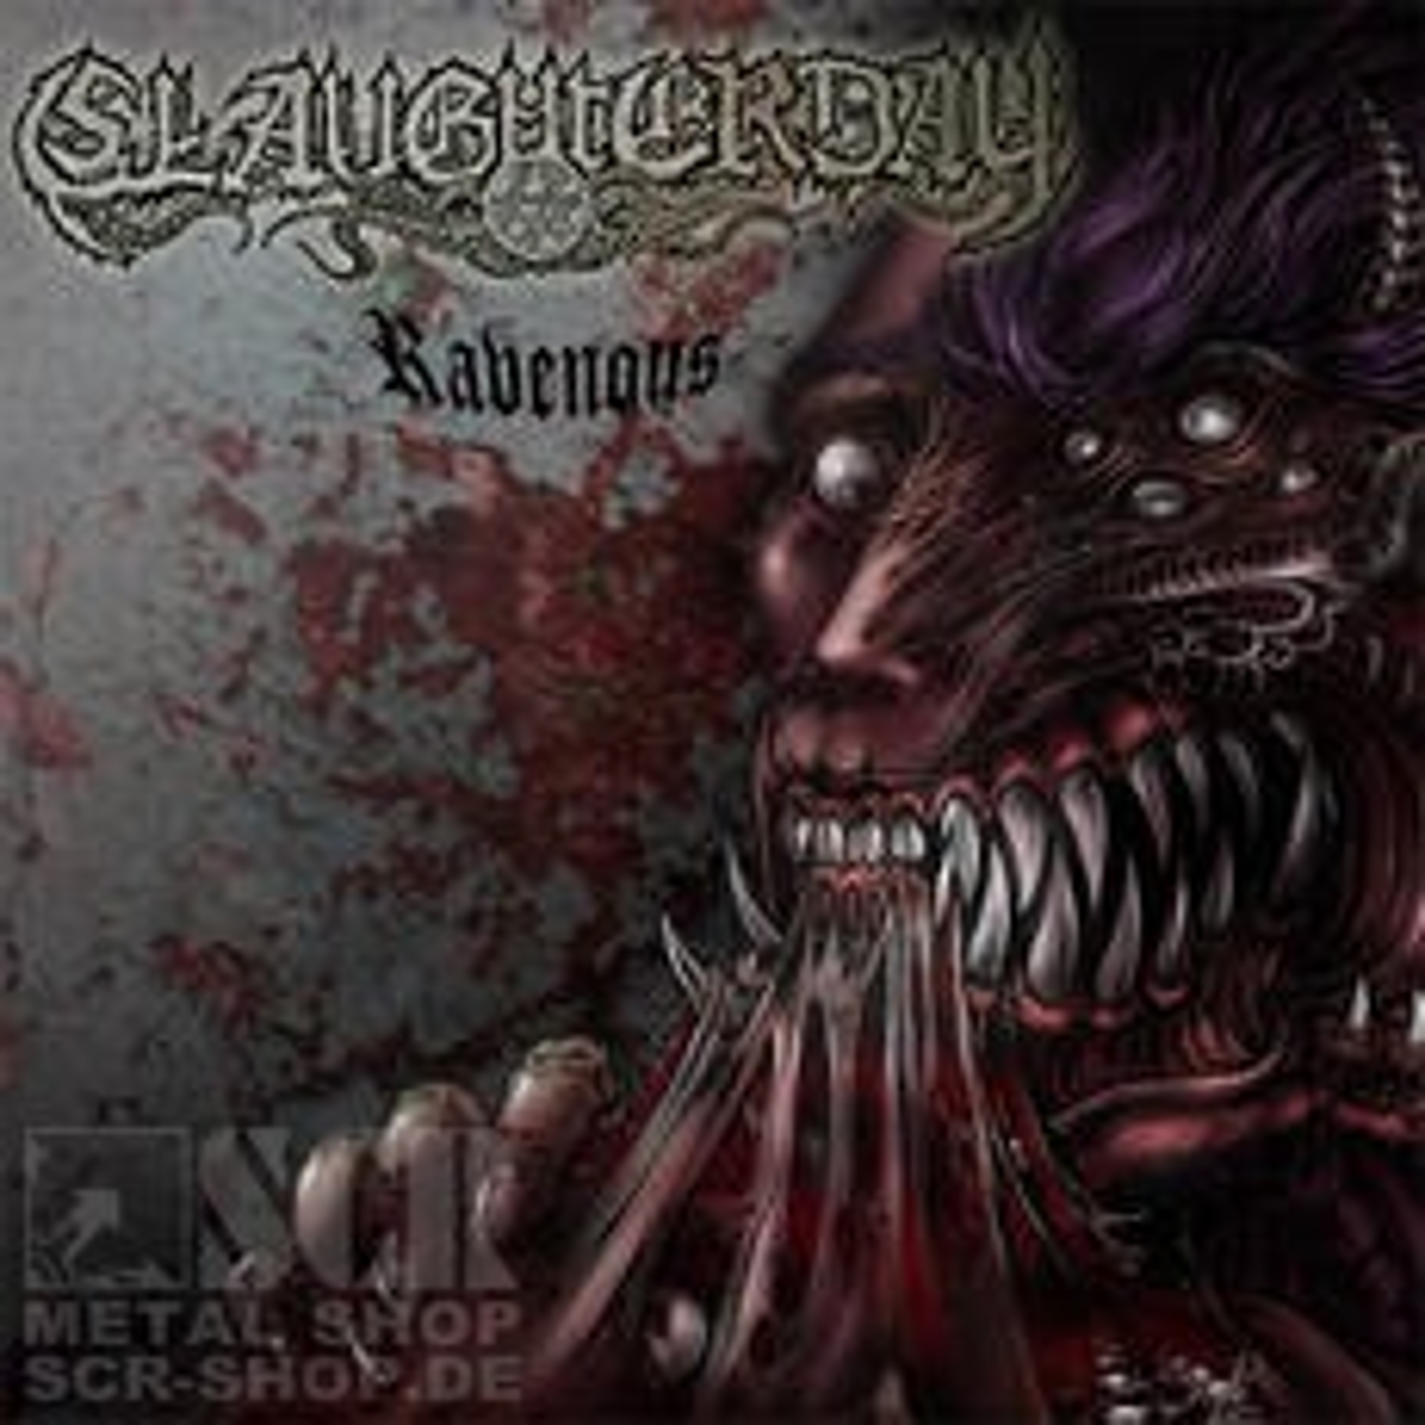 SLAUGHTERDAY - Ravenous (MCD)